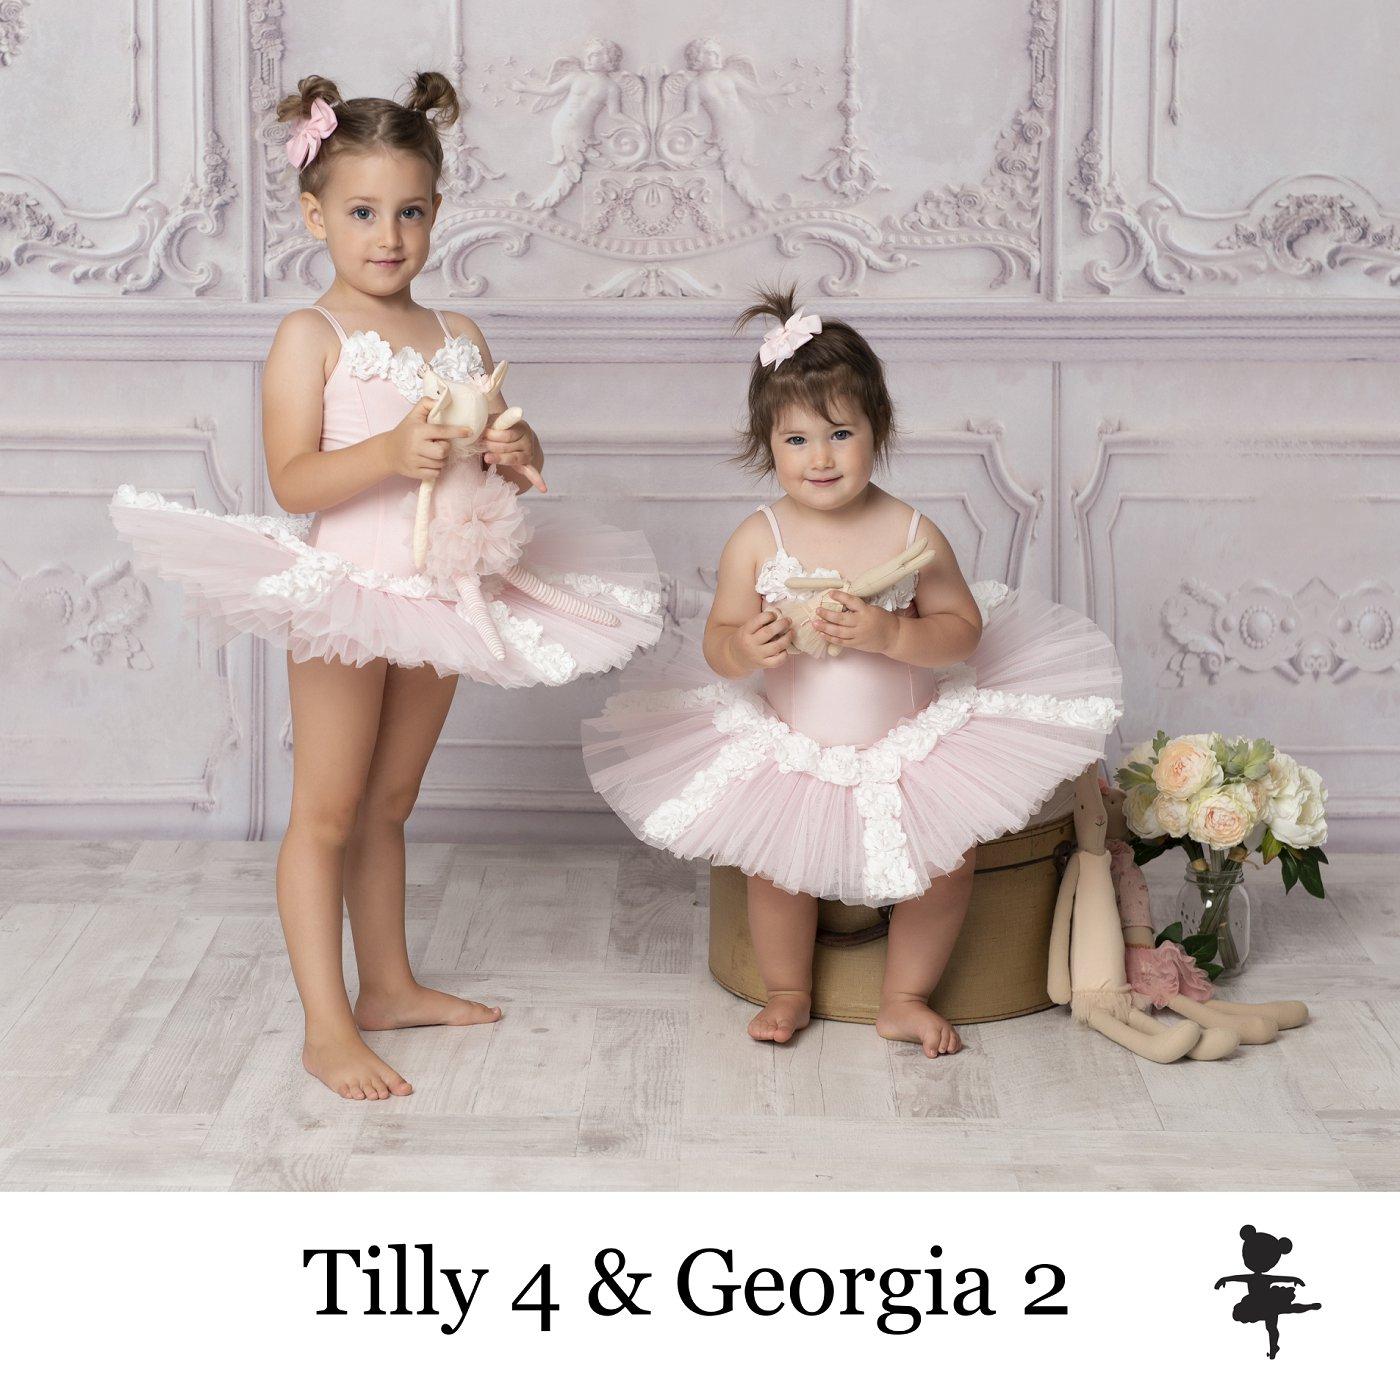 LB2219-Tilly 4 & Georgia 2.jpg